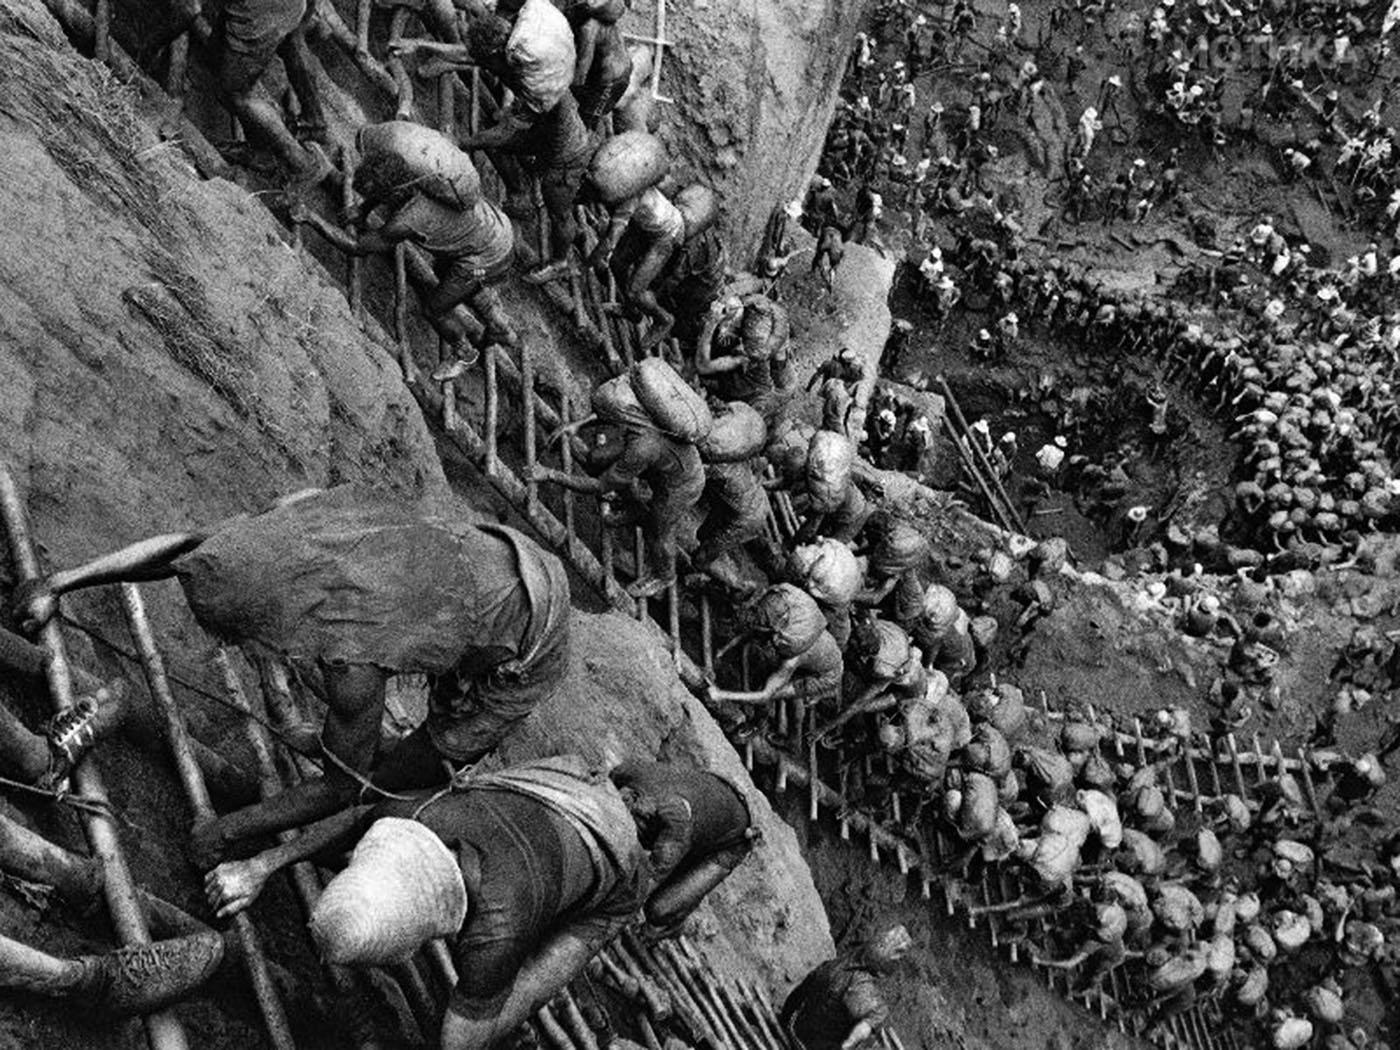 the-hell-of-sierra-pelada-mines-1980s-10